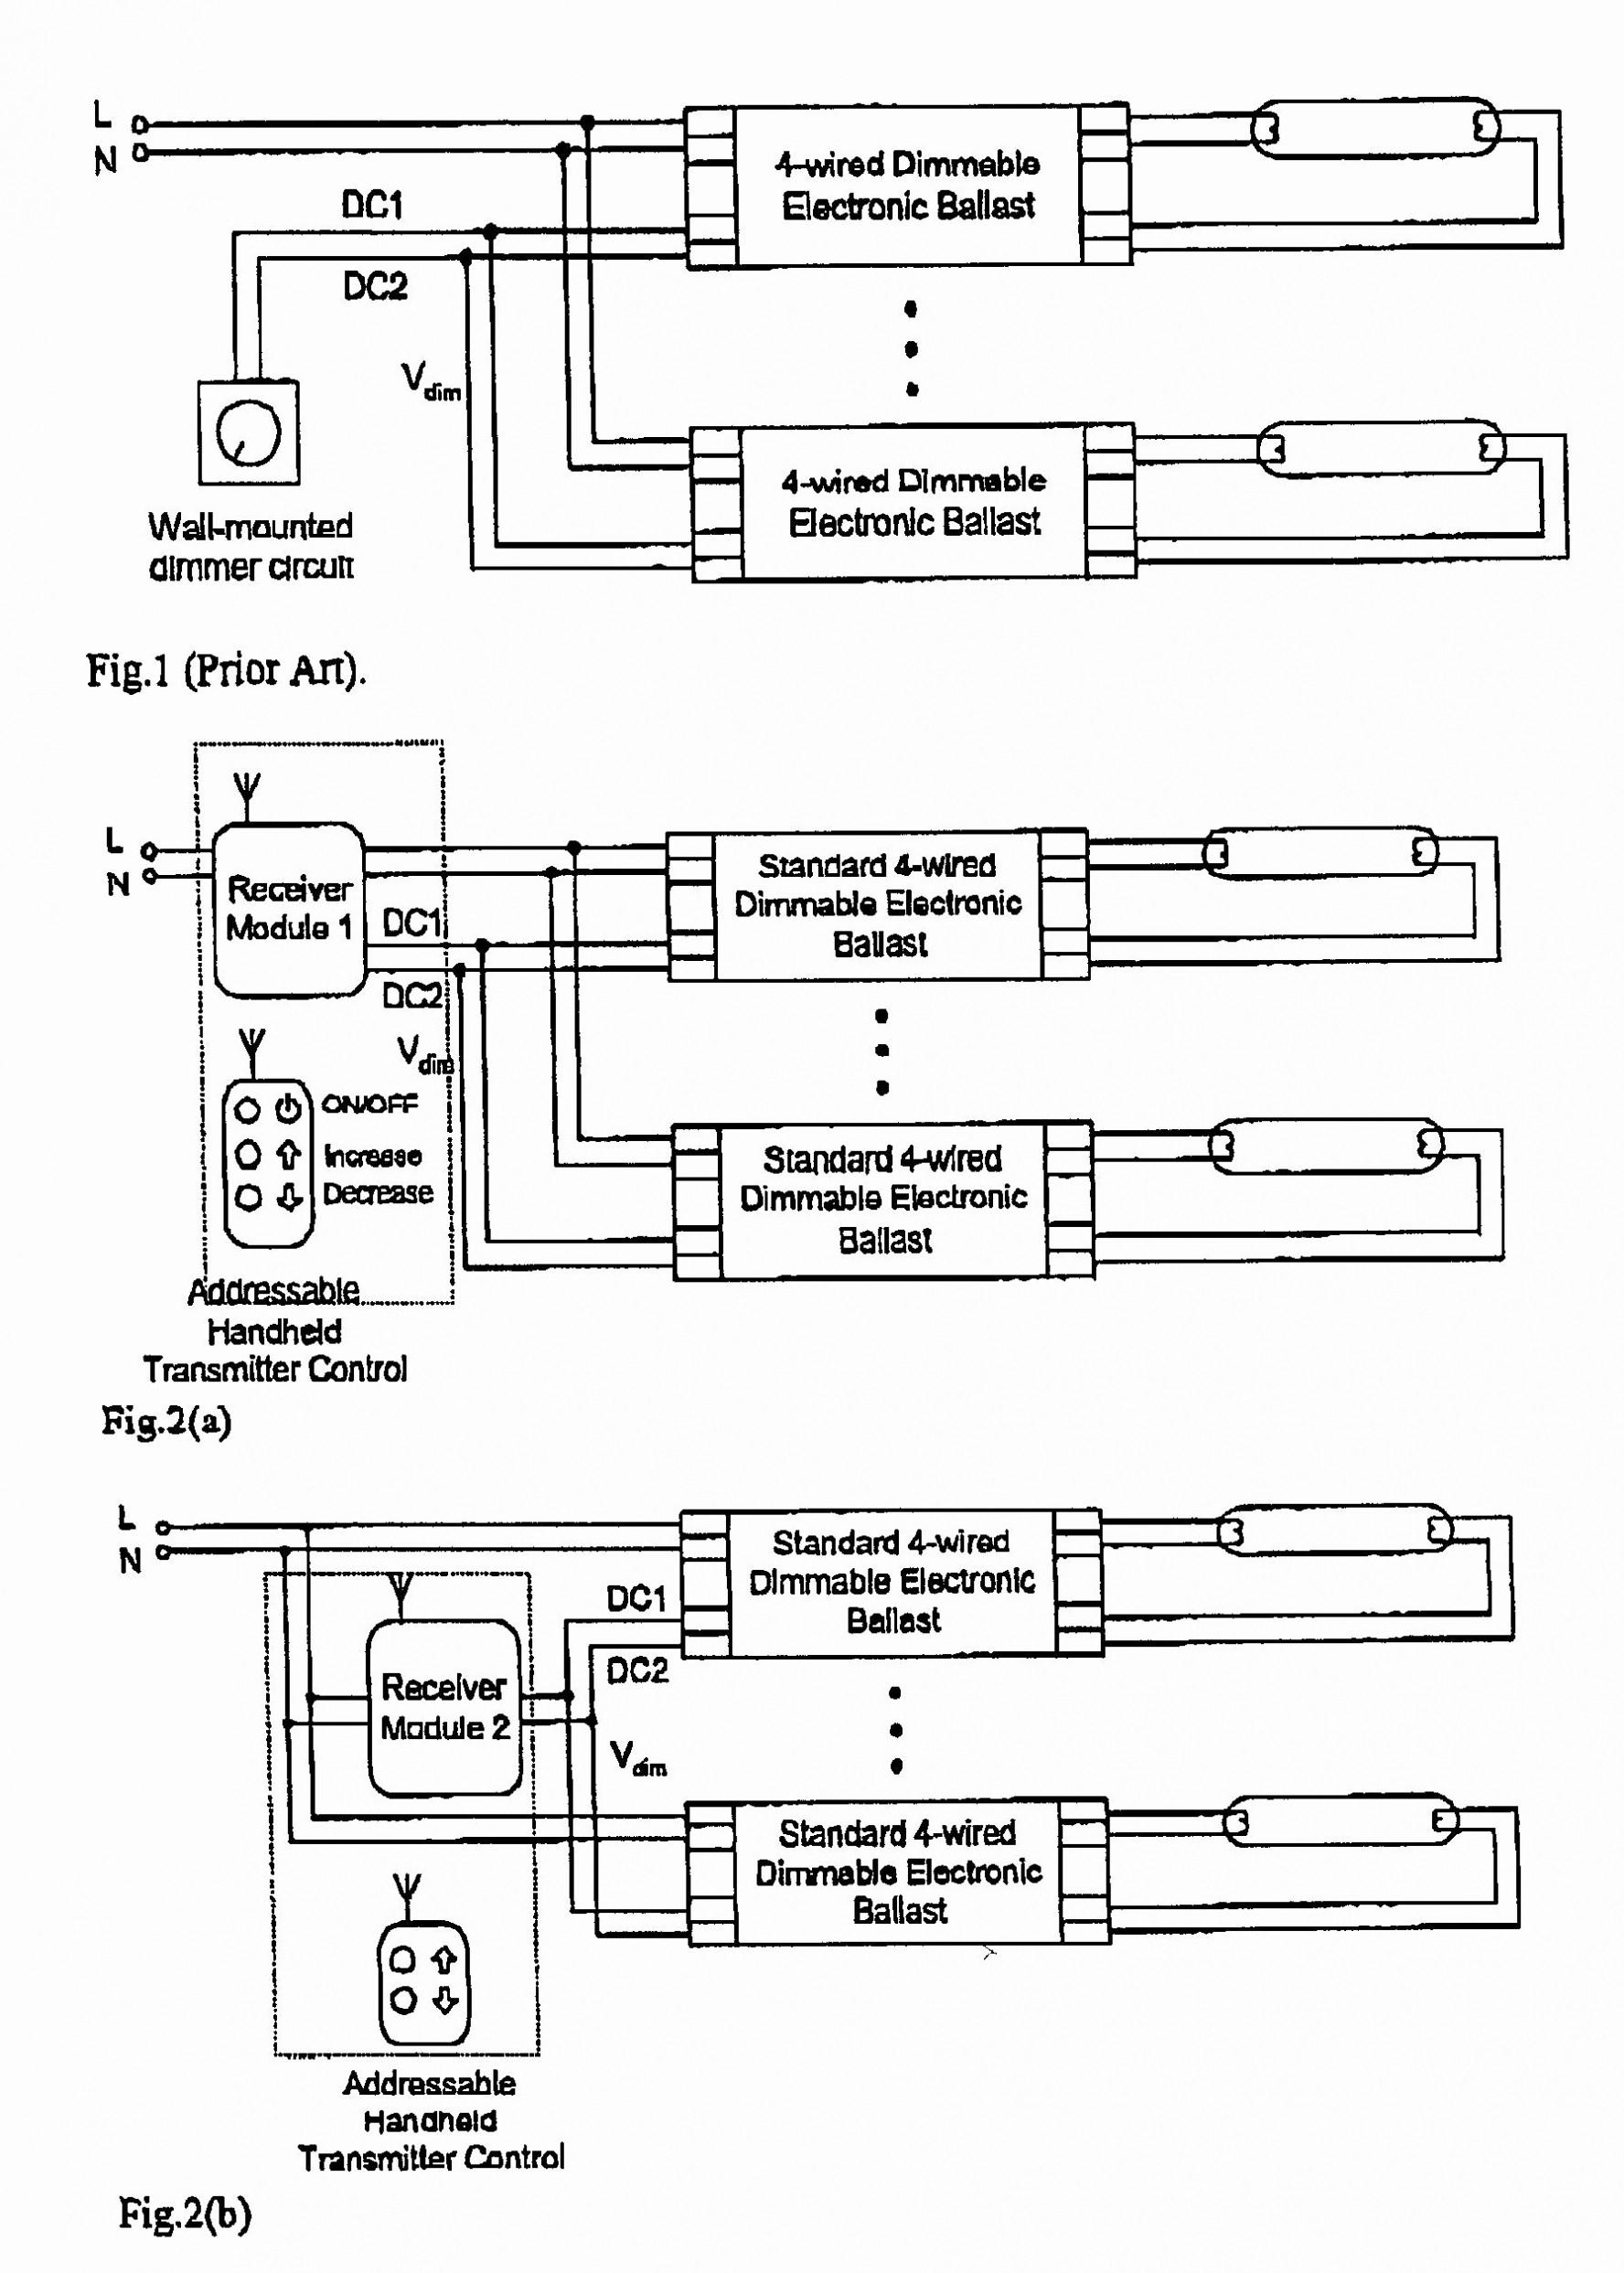 Bulb Electronic Ballast Wiring Diagram on fluorescent fixtures t5 circuit diagram, 2 bulb ballast wiring diagram, 4 pin ballast wiring diagram, two lamp ballast wire diagram, ballast replacement diagram, 4 bulb ballast wiring two,